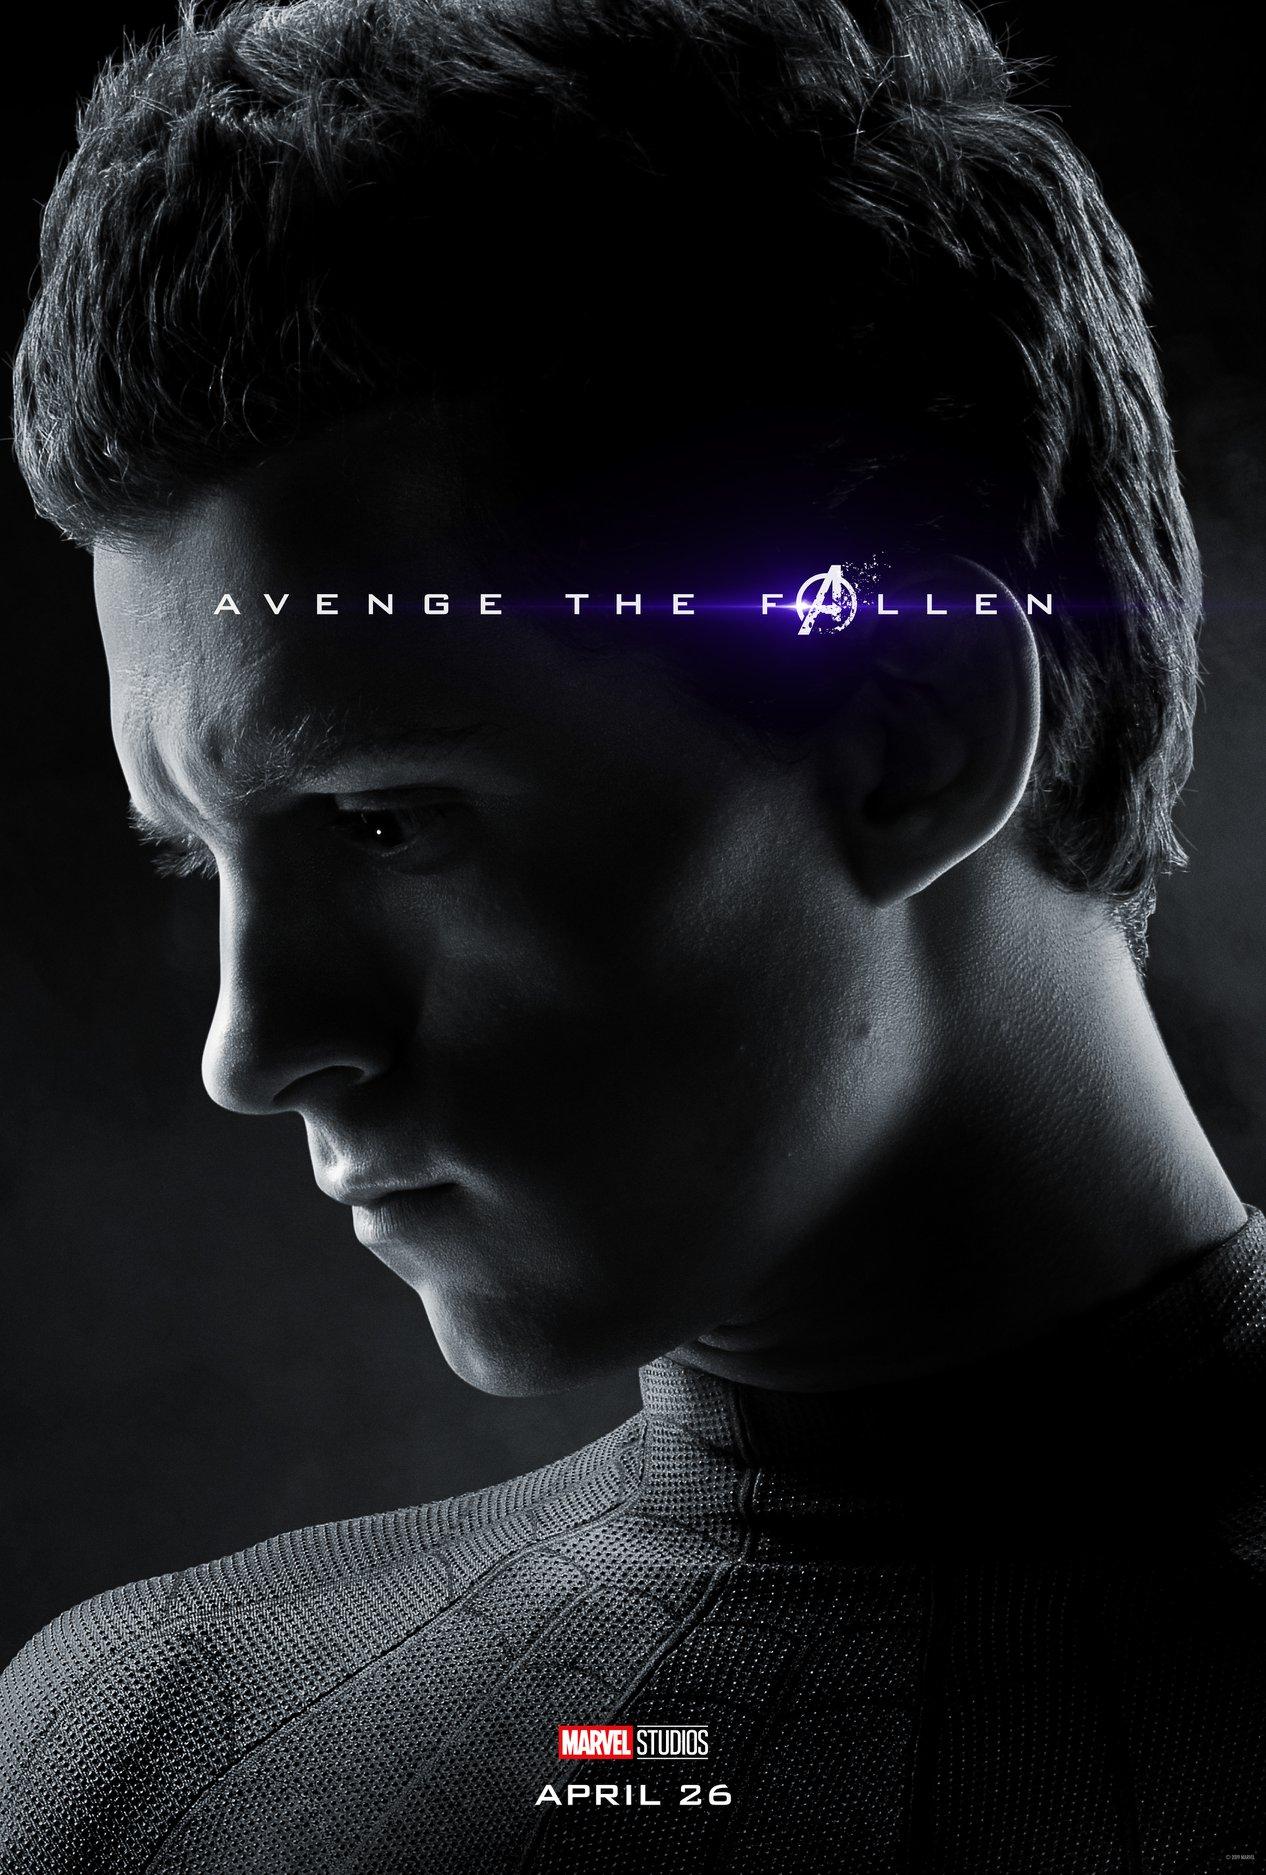 avengers_endgame_p24.png